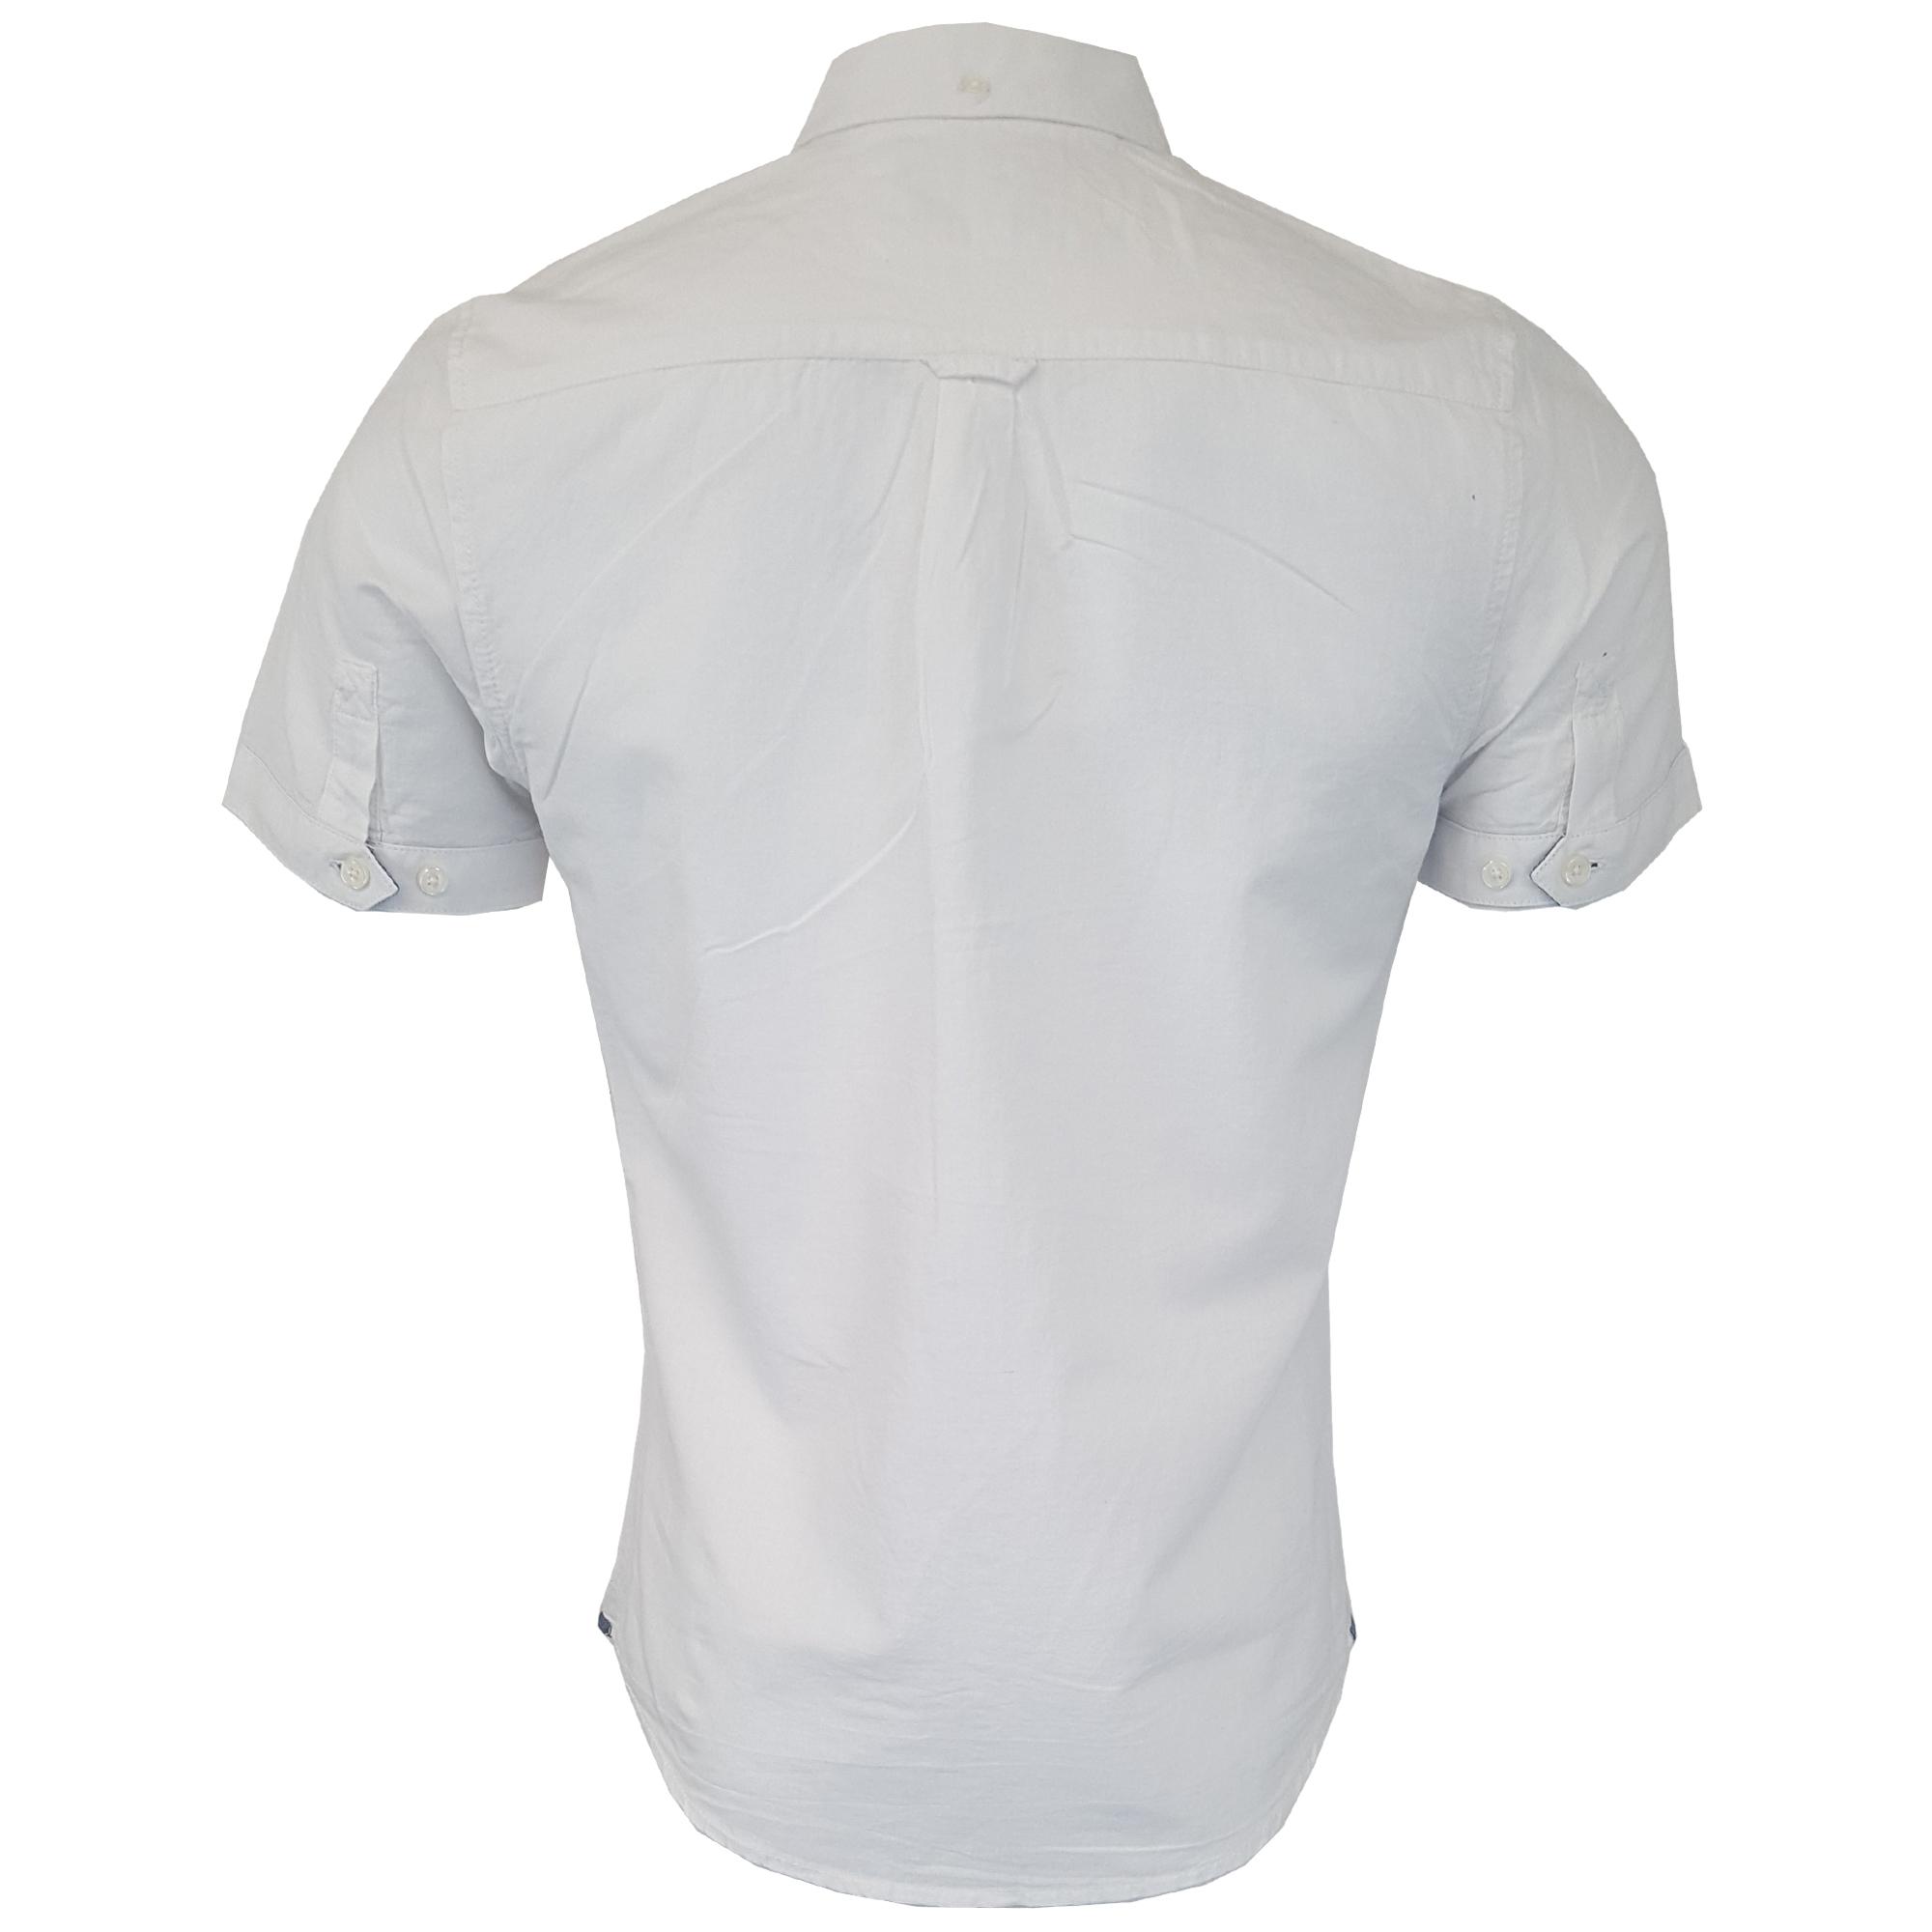 Mens-Linen-Cotton-Shirt-Tokyo-Laundry-Wells-Short-Sleeved-Grosvenor-Summer-New thumbnail 15